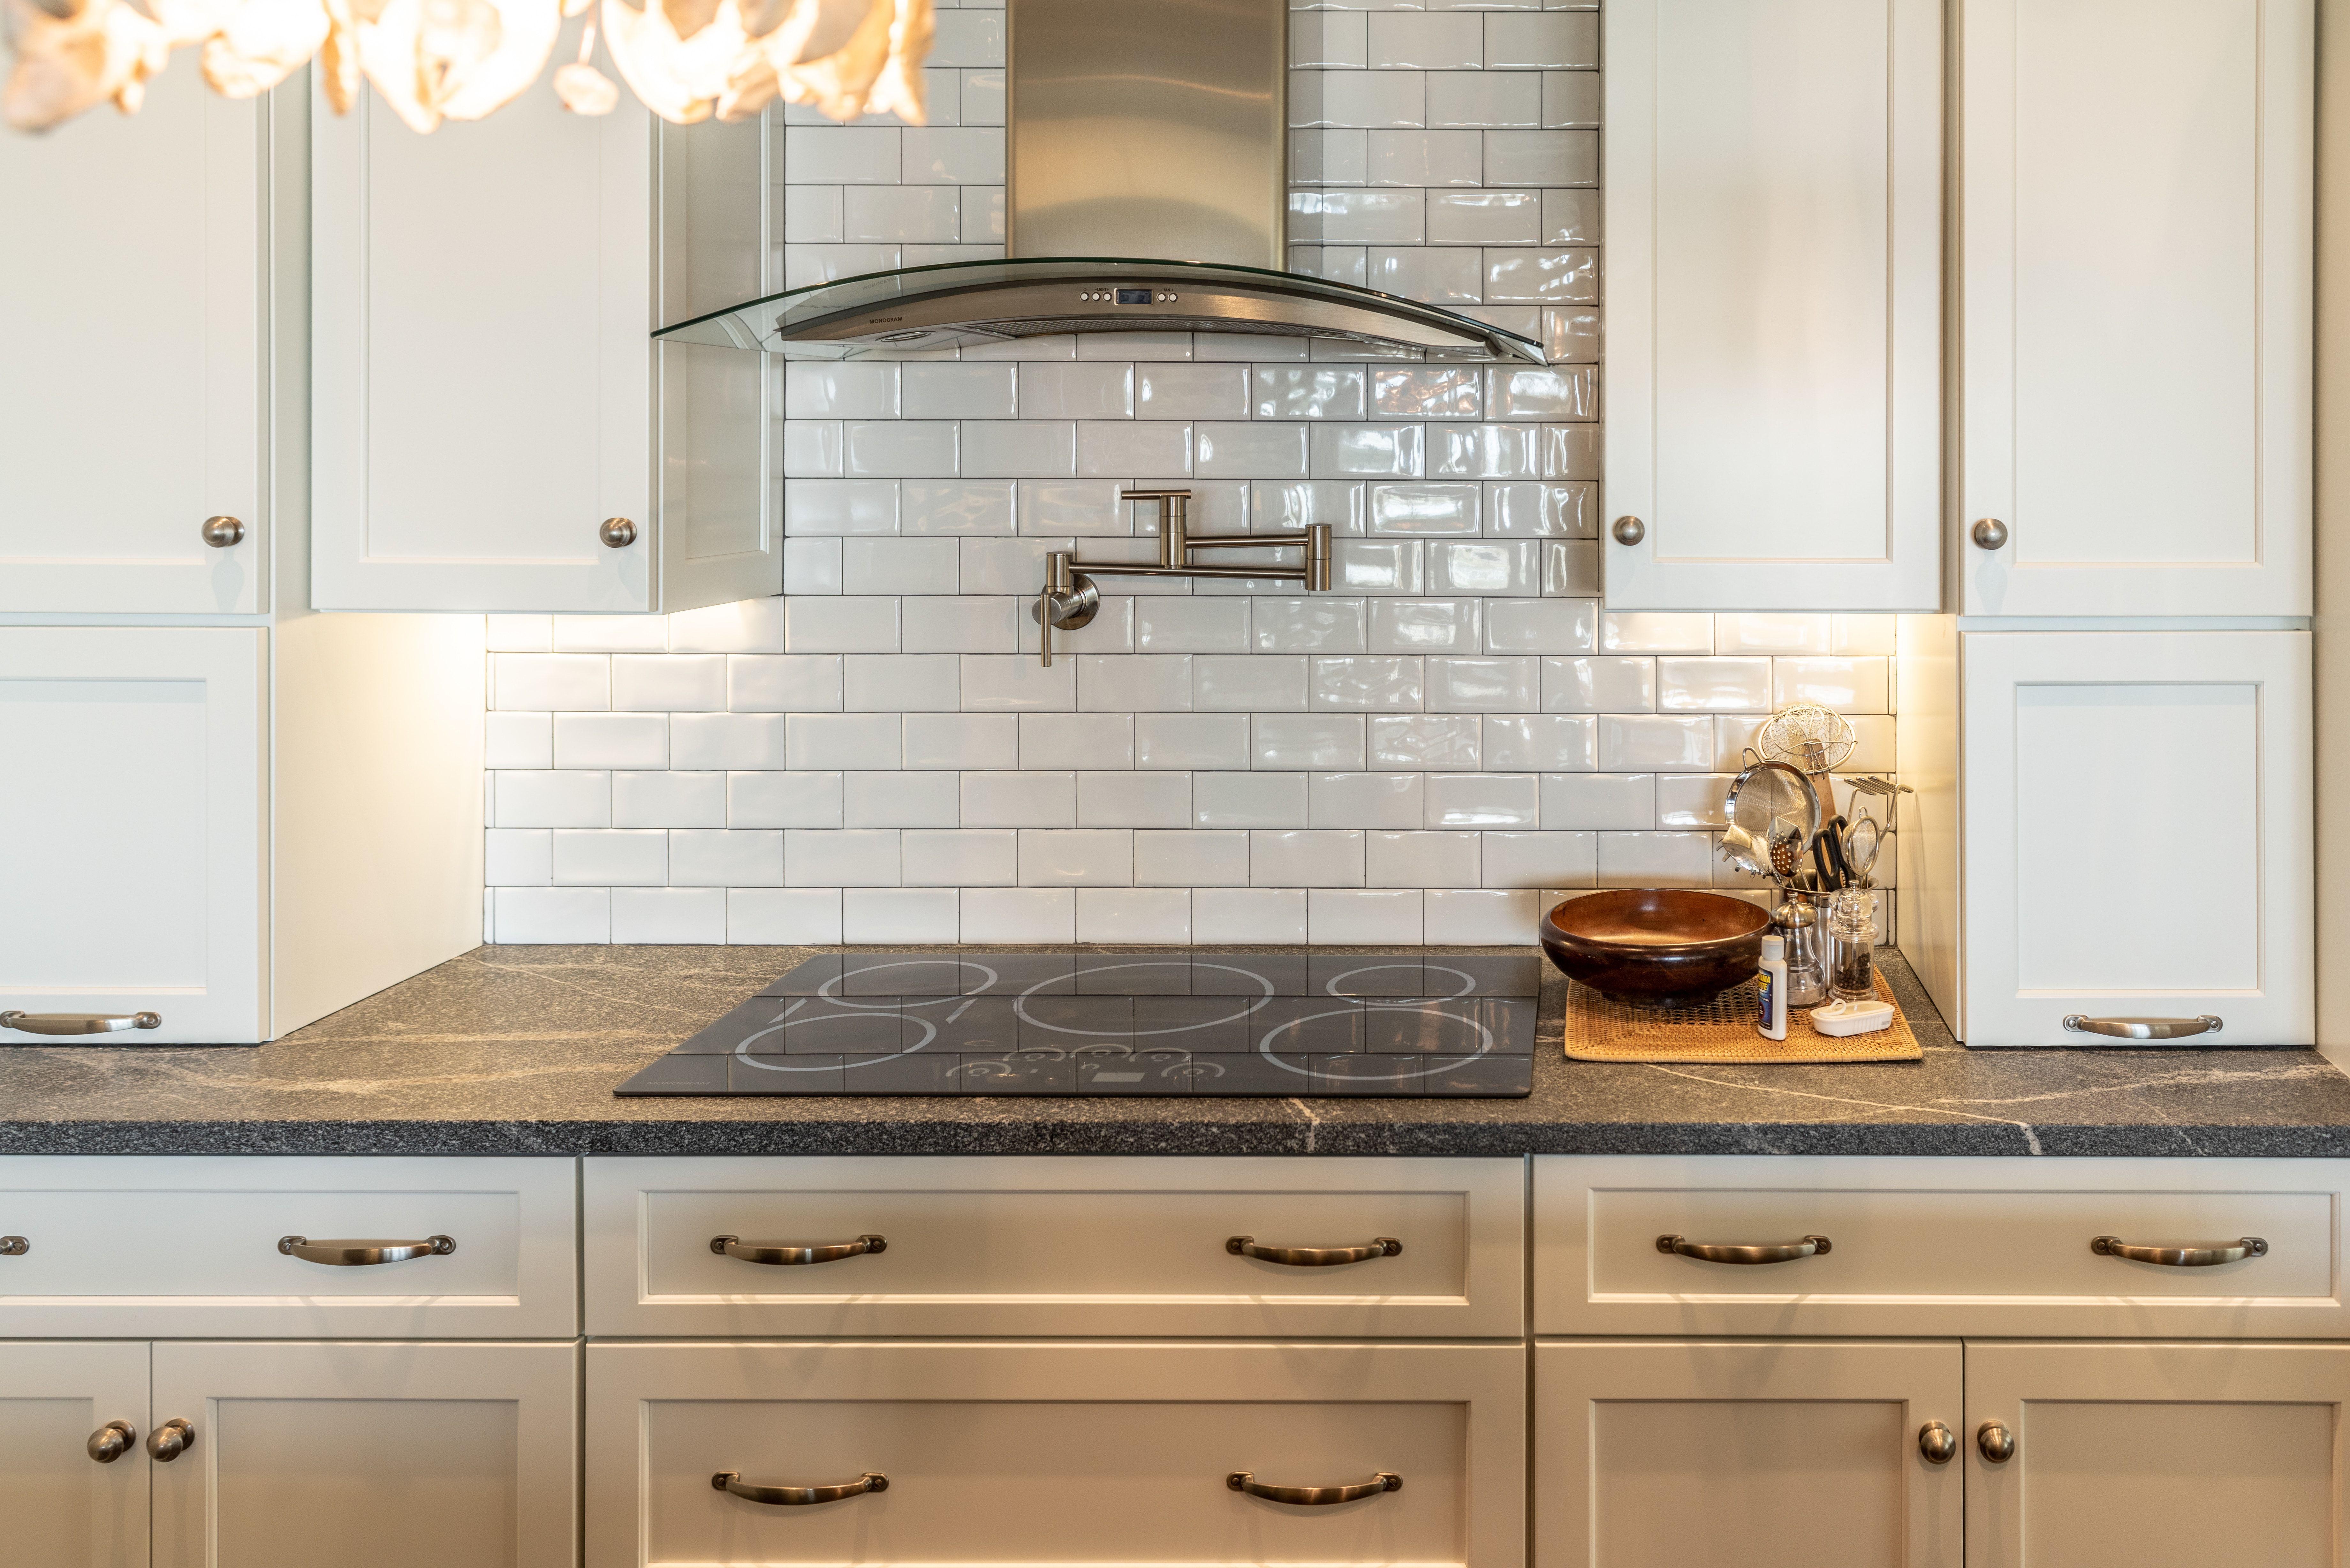 - We Love The Use Of Glazed Ceramic Subway Tiles As A Backsplash In